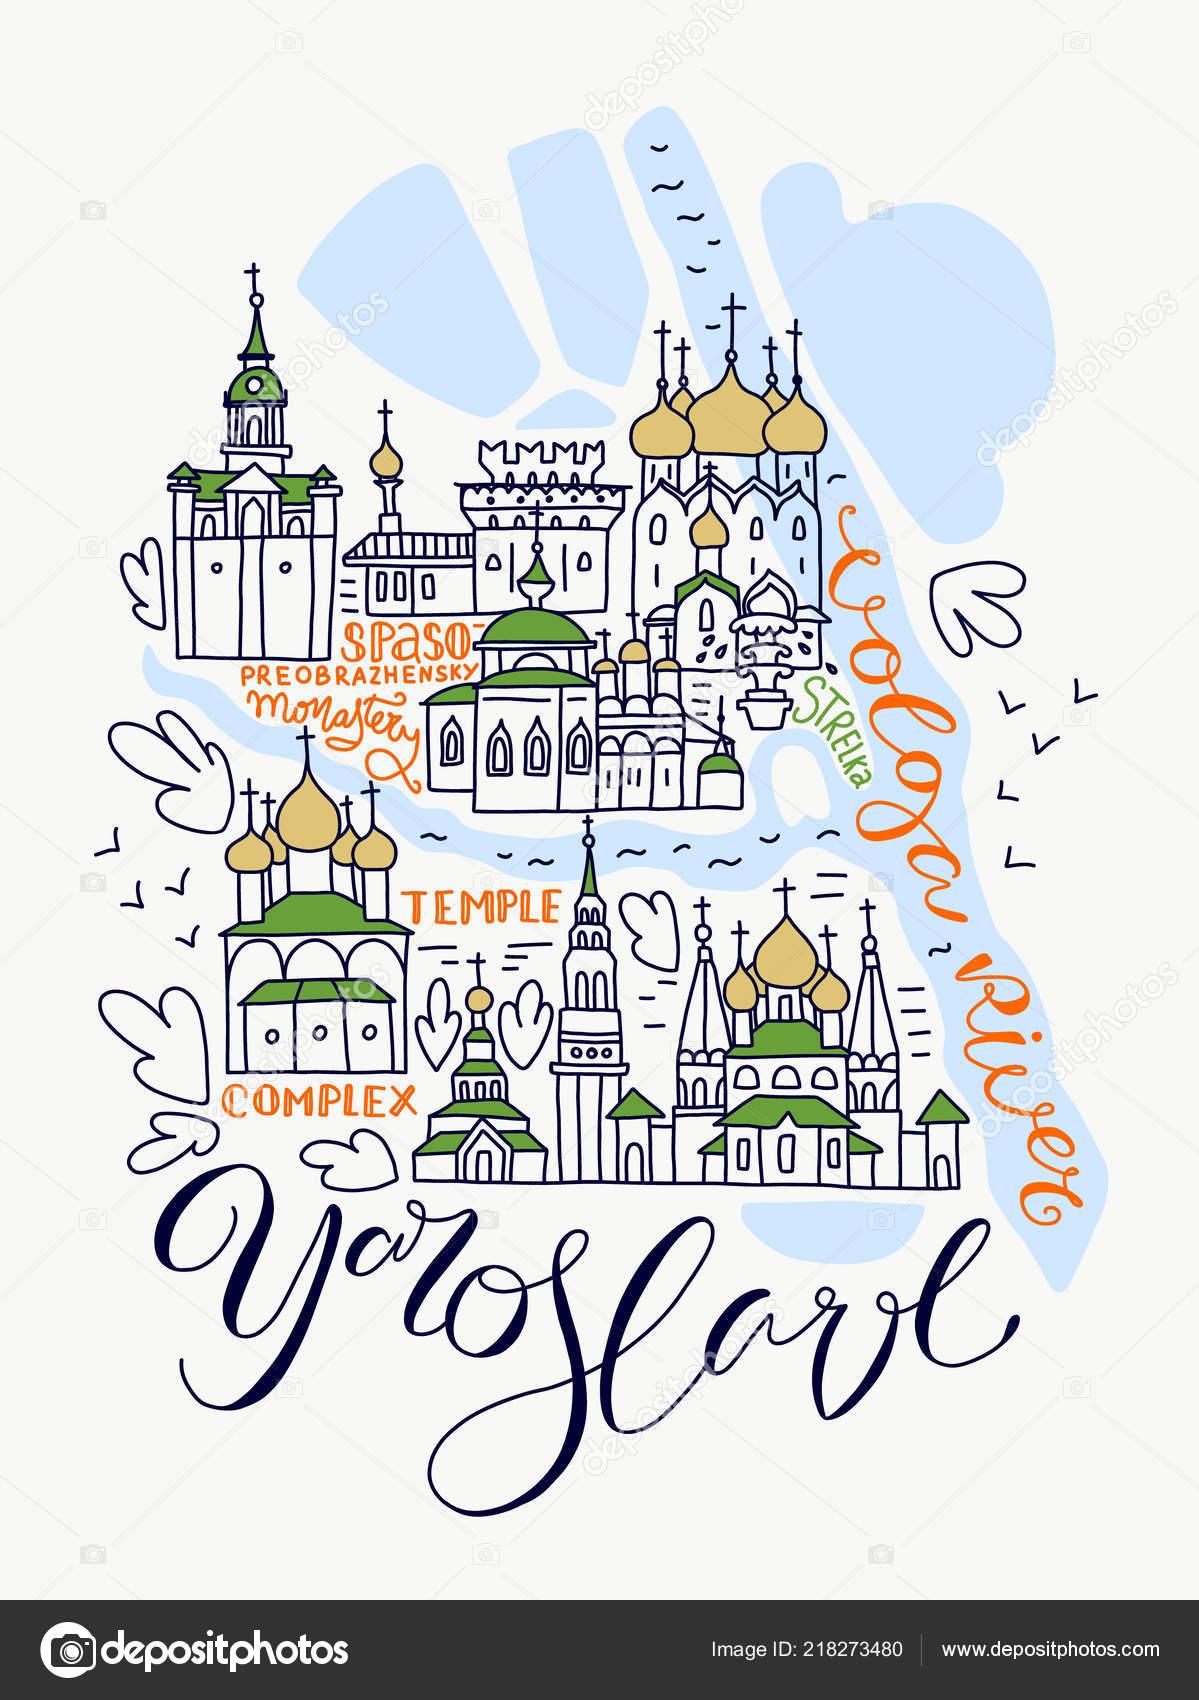 Yaroslavl City Part Russia Golden Ring Map Vector Hand Drawn — Stock on elista russia map, tyumen russia map, mandrogi russia map, saint petersburg, yekaterinburg russia map, zagorsk russia map, altai krai russia map, simferopol russia map, astrakhan russia map, severomorsk russia map, sevastopol russia map, samarkand russia map, uglich russia map, tallinn russia map, murmansk russia map, lokomotiv yaroslavl, lake baikal, nizhny novgorod, yurga russia map, tuva russia map, kalmykia russia map, krasnogorsk russia map, sarajevo russia map,